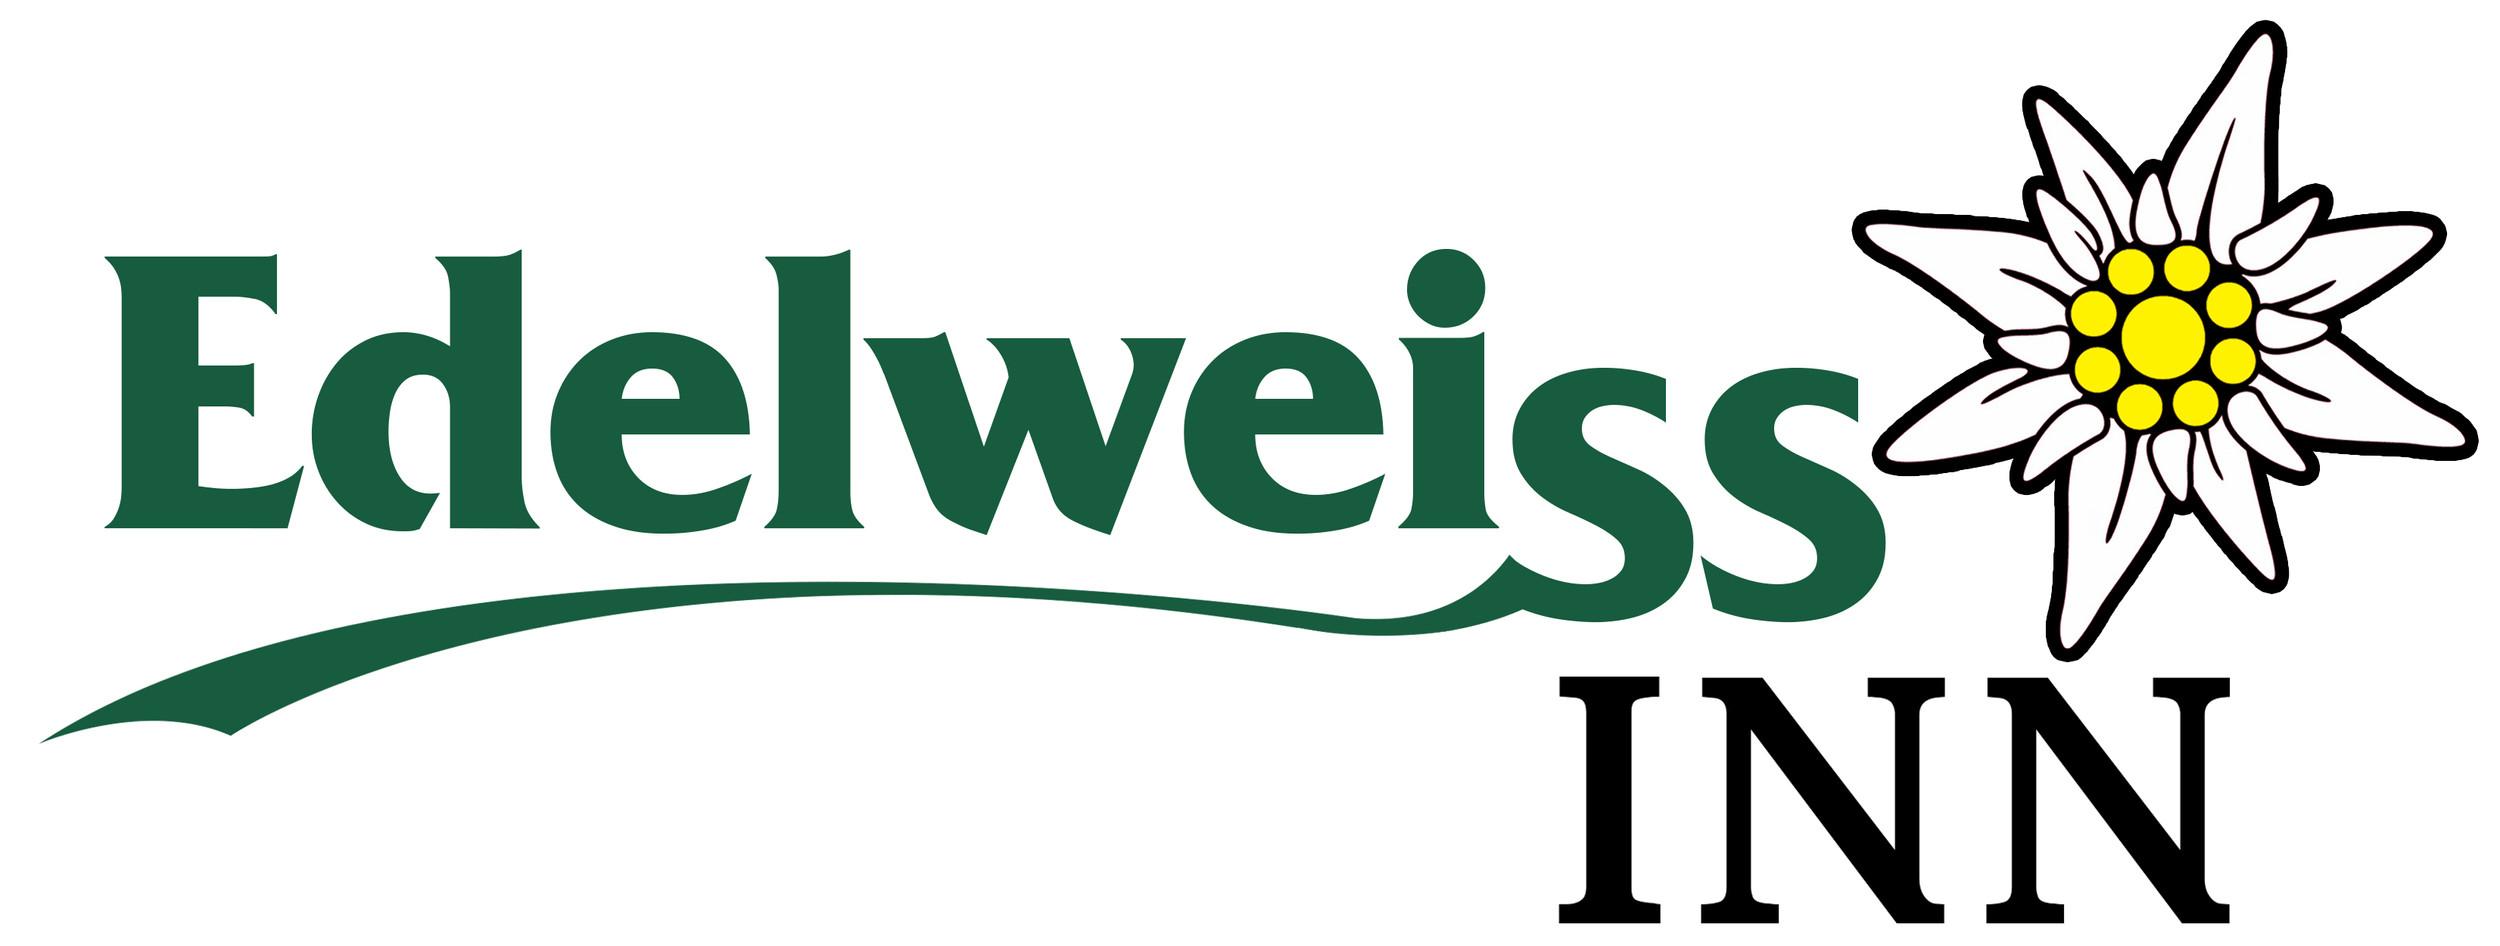 www.edelweissinn.com